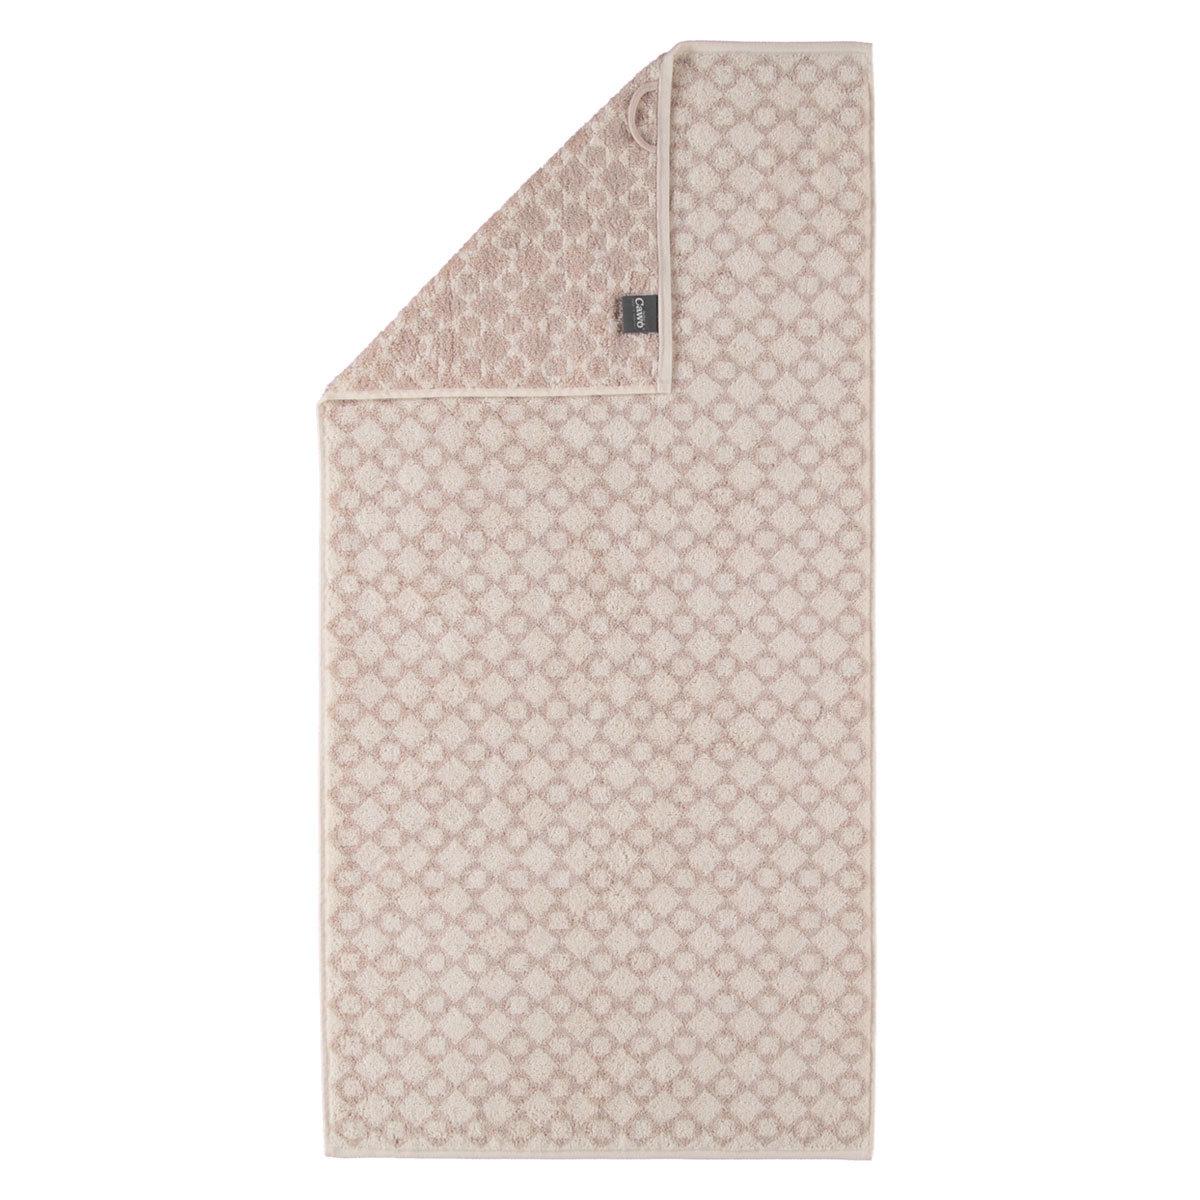 caw handt cher 585 diamant natur g nstig online kaufen bei bettwaren shop. Black Bedroom Furniture Sets. Home Design Ideas